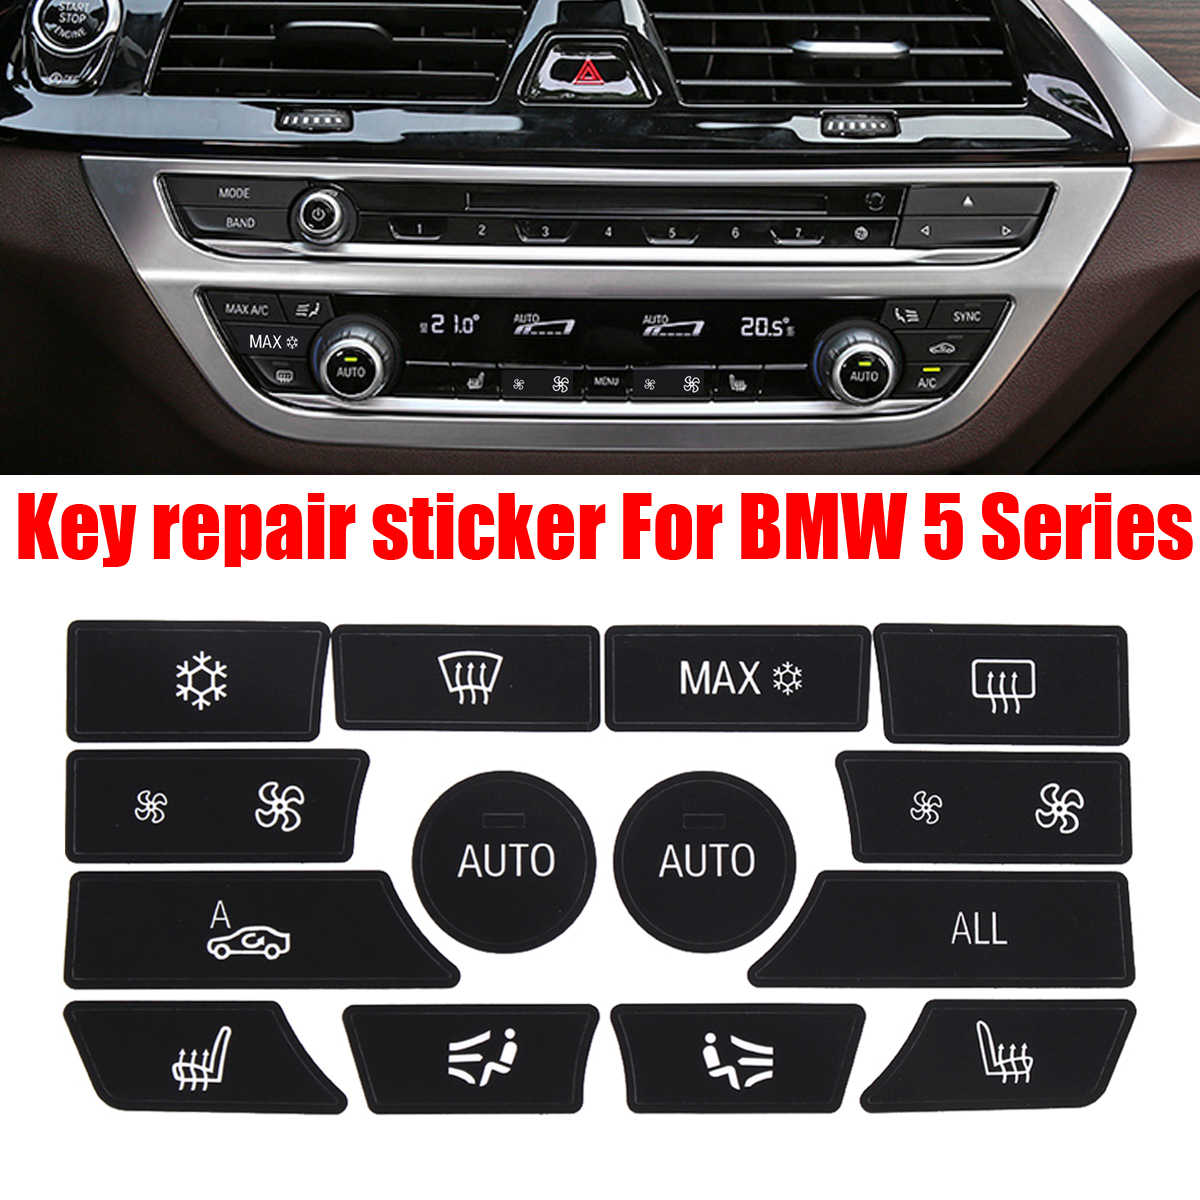 button sticker for bmw dash climate control panel button repair car sticker decal kit for bmw 5 series car sticker